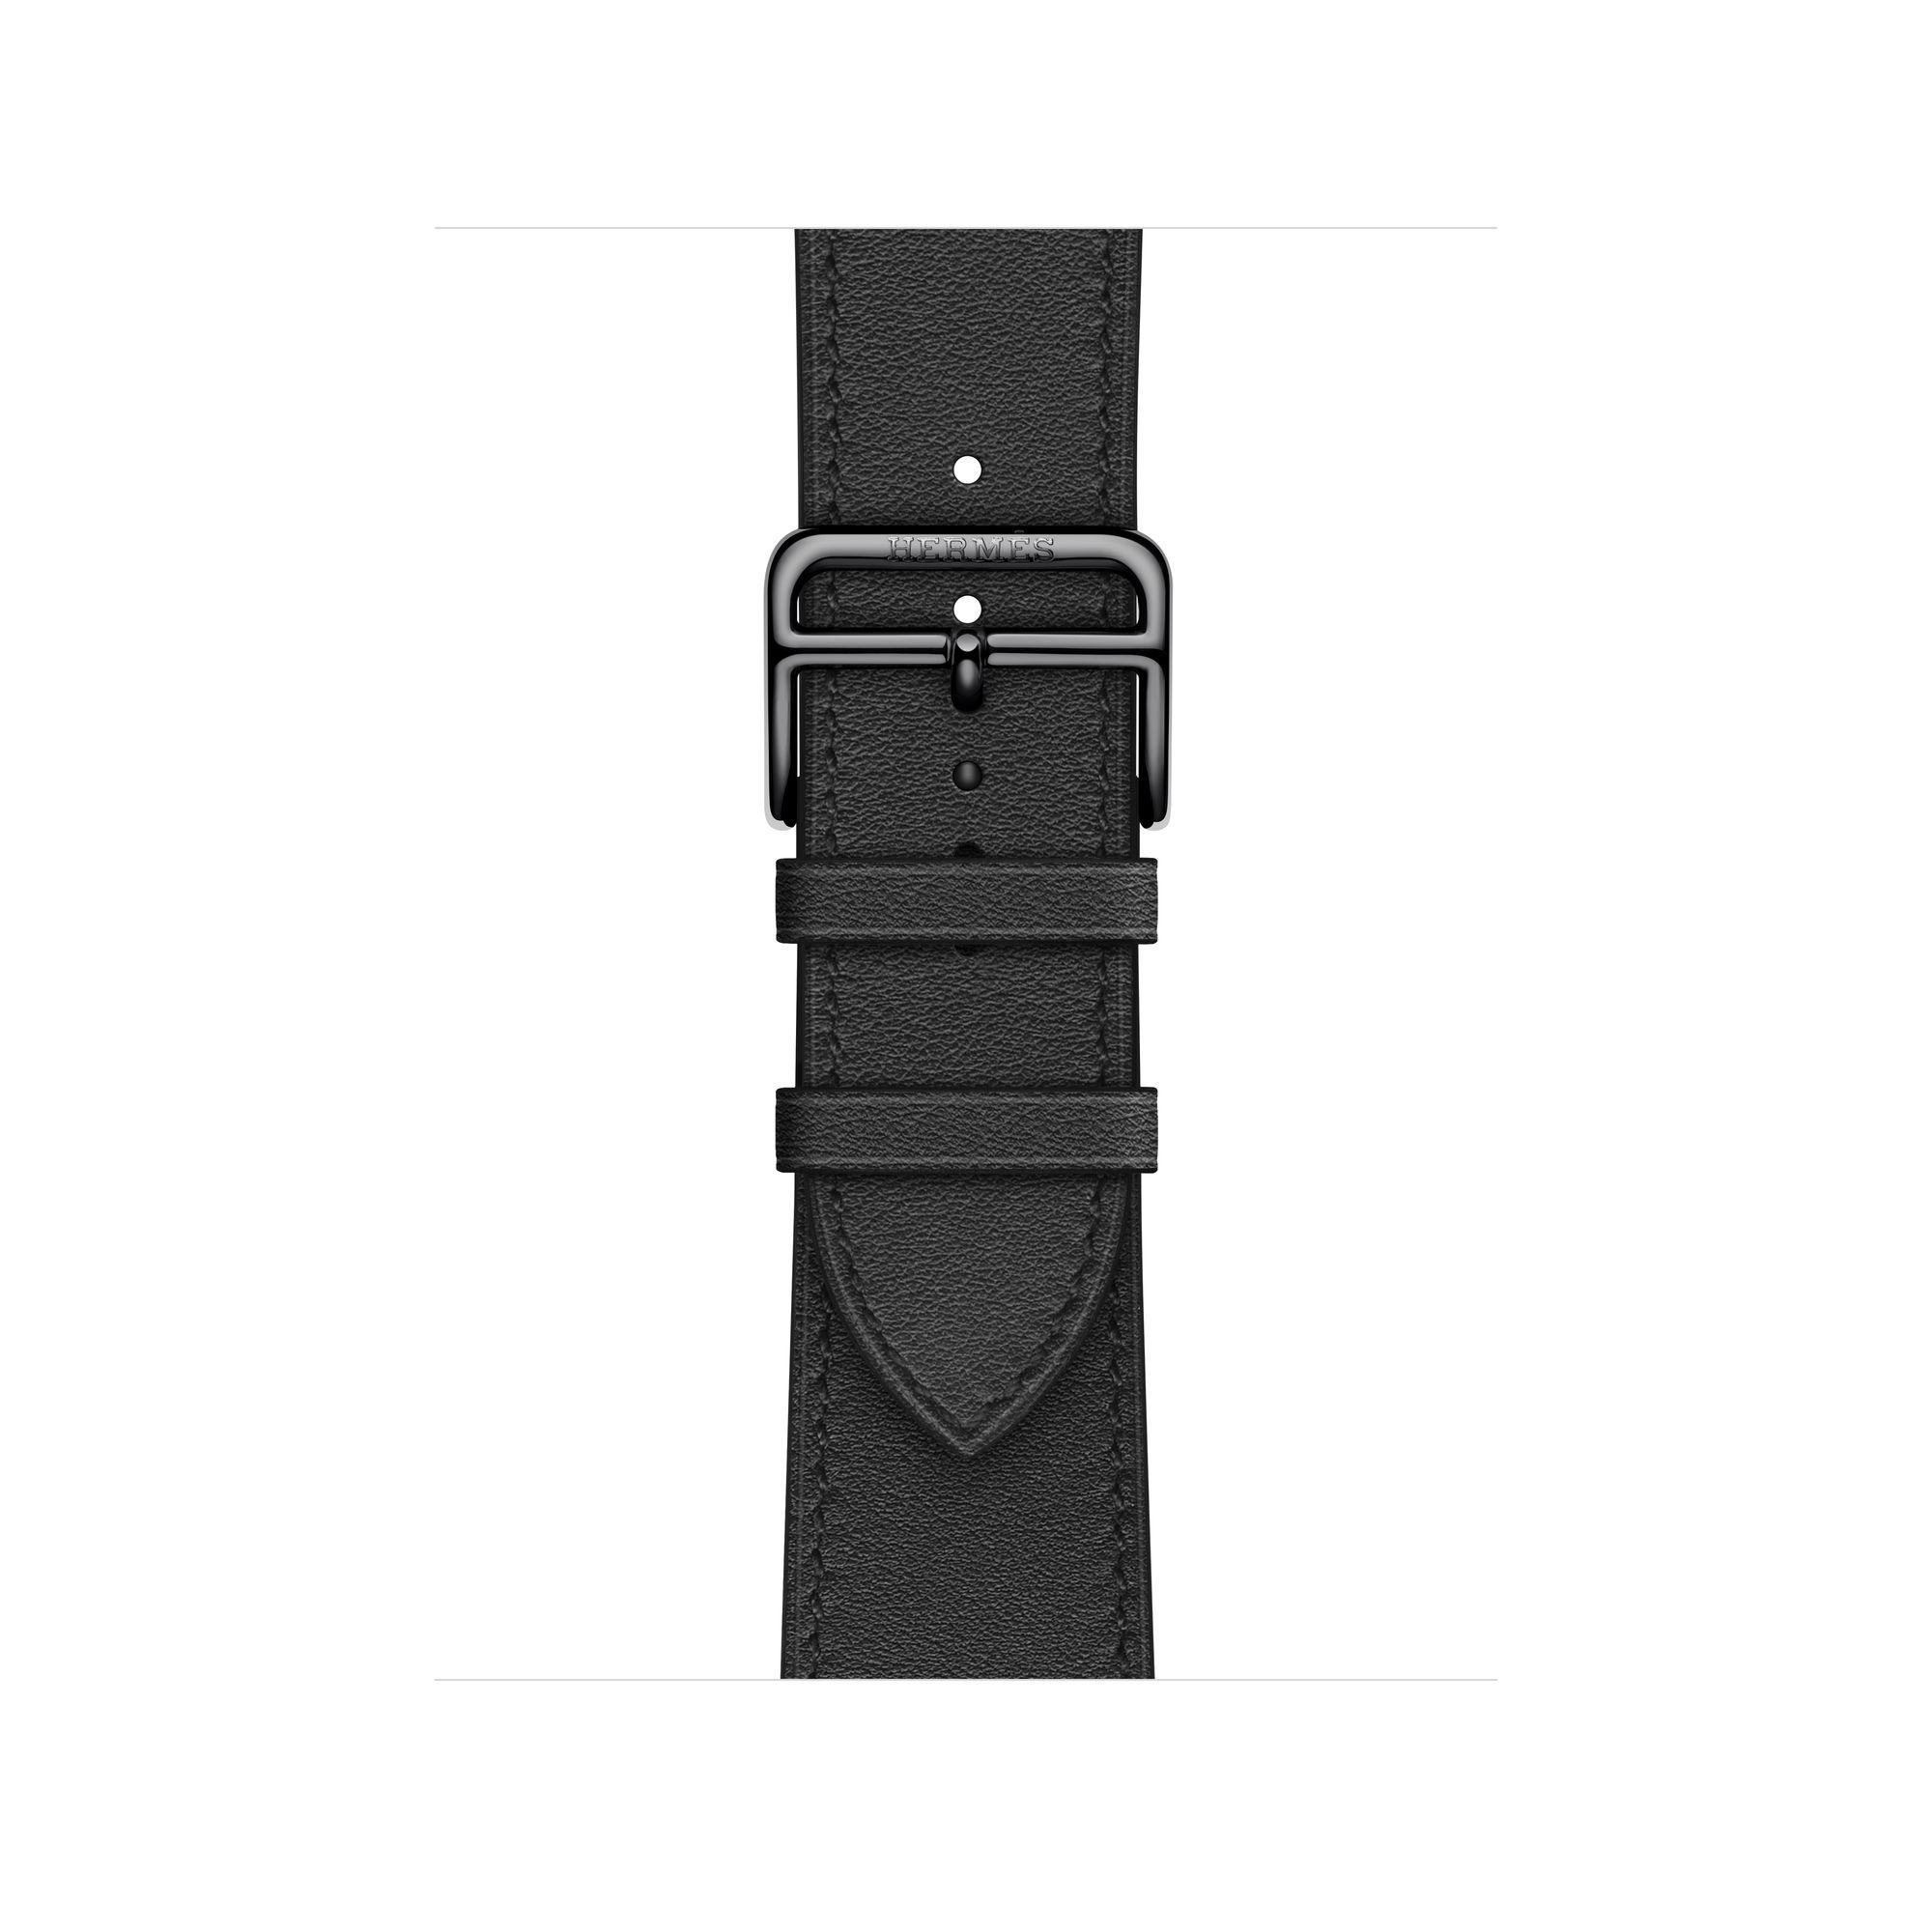 Apple Watch HERMES ヴォー・スウィフト(黒)レザーストラップ